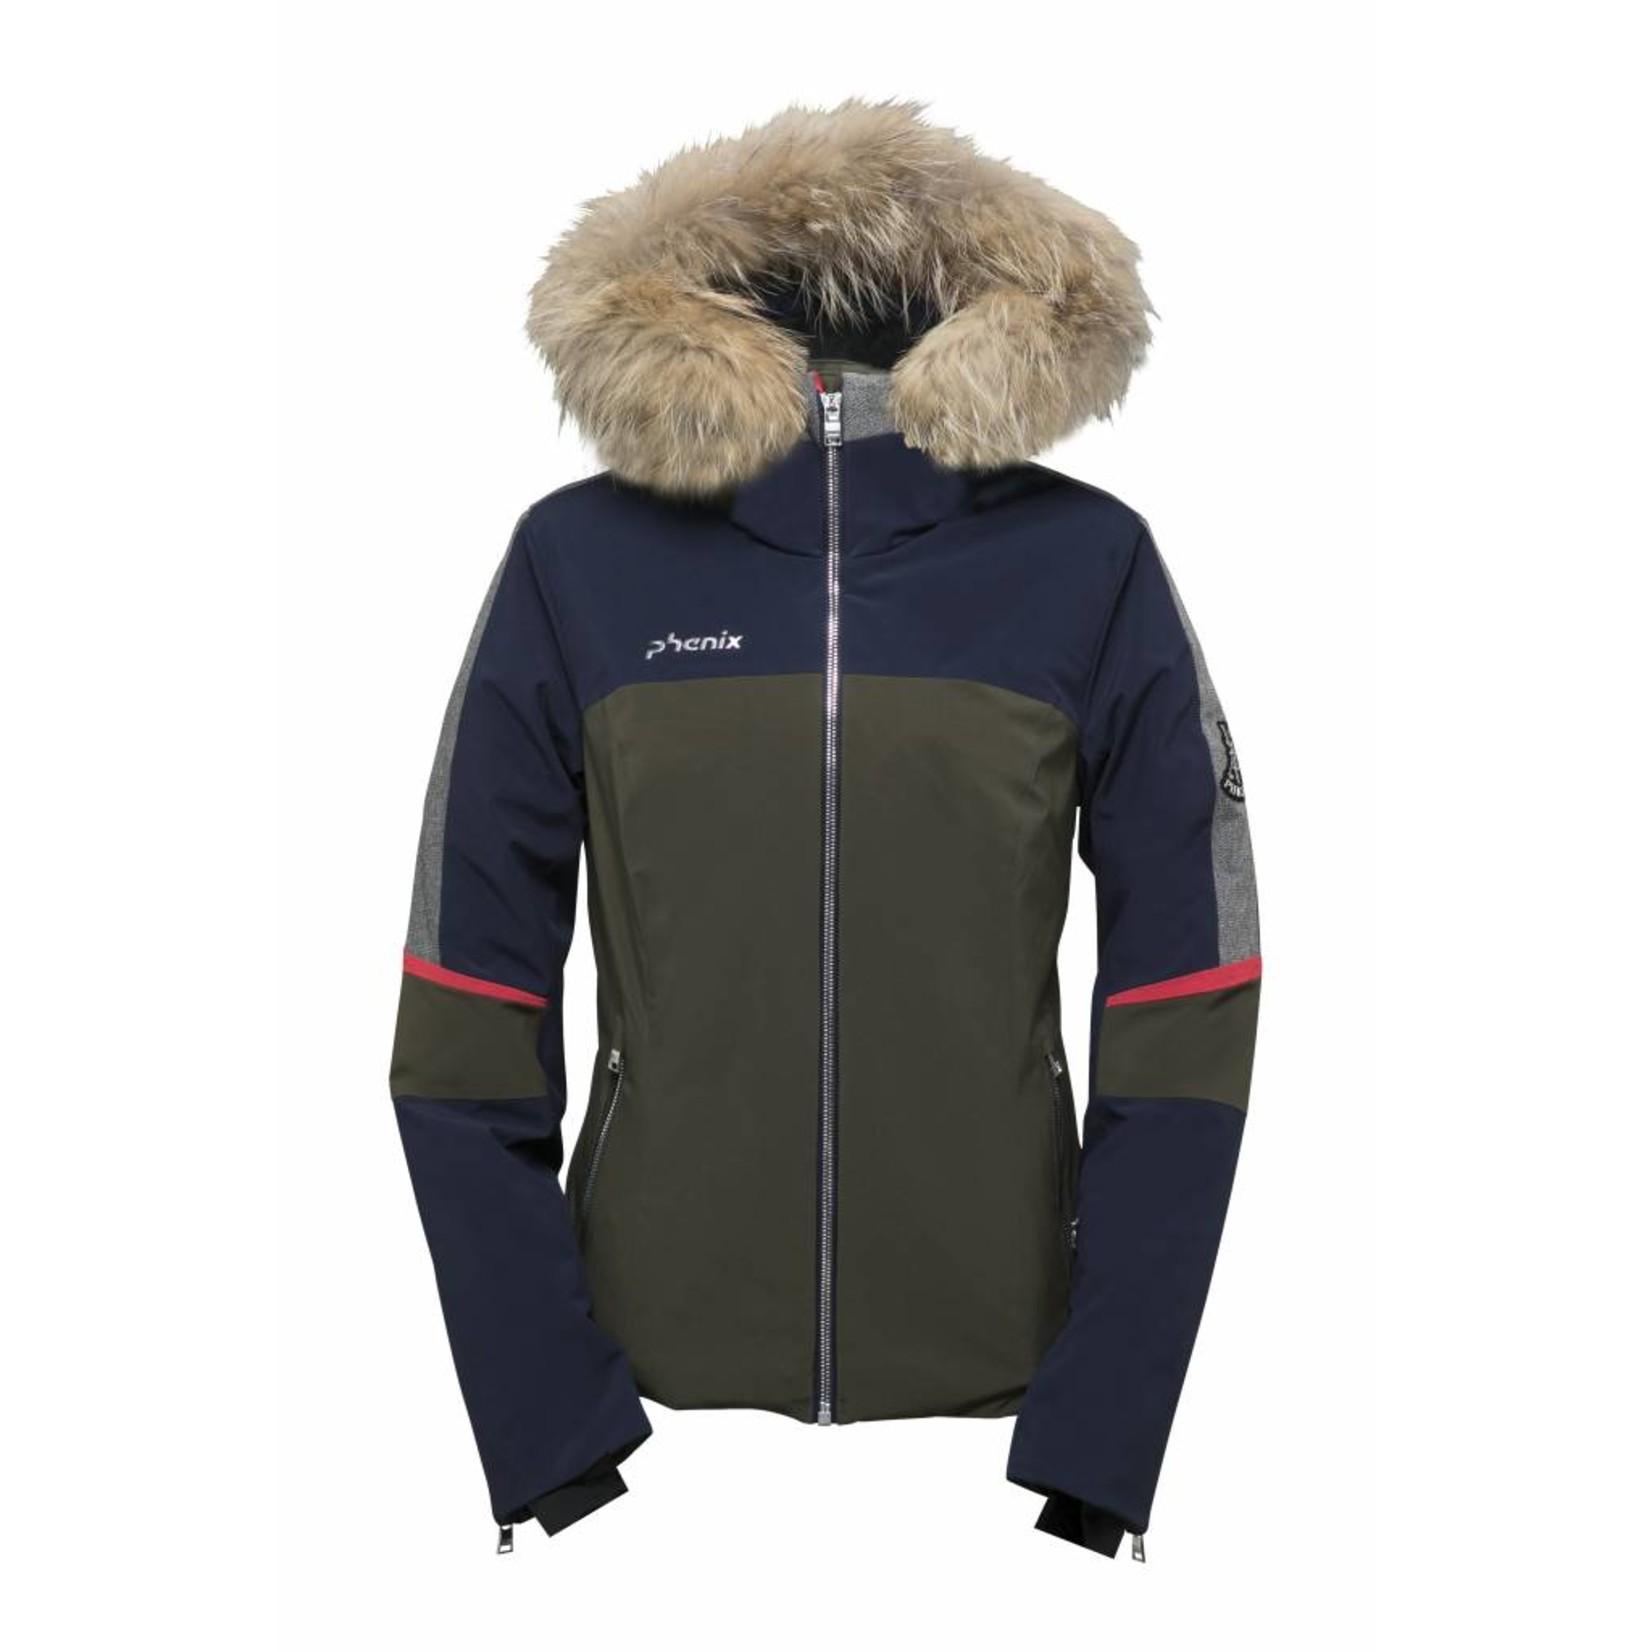 PHENIX Amanda Hybrid Down Jacket with Raccoon Fur